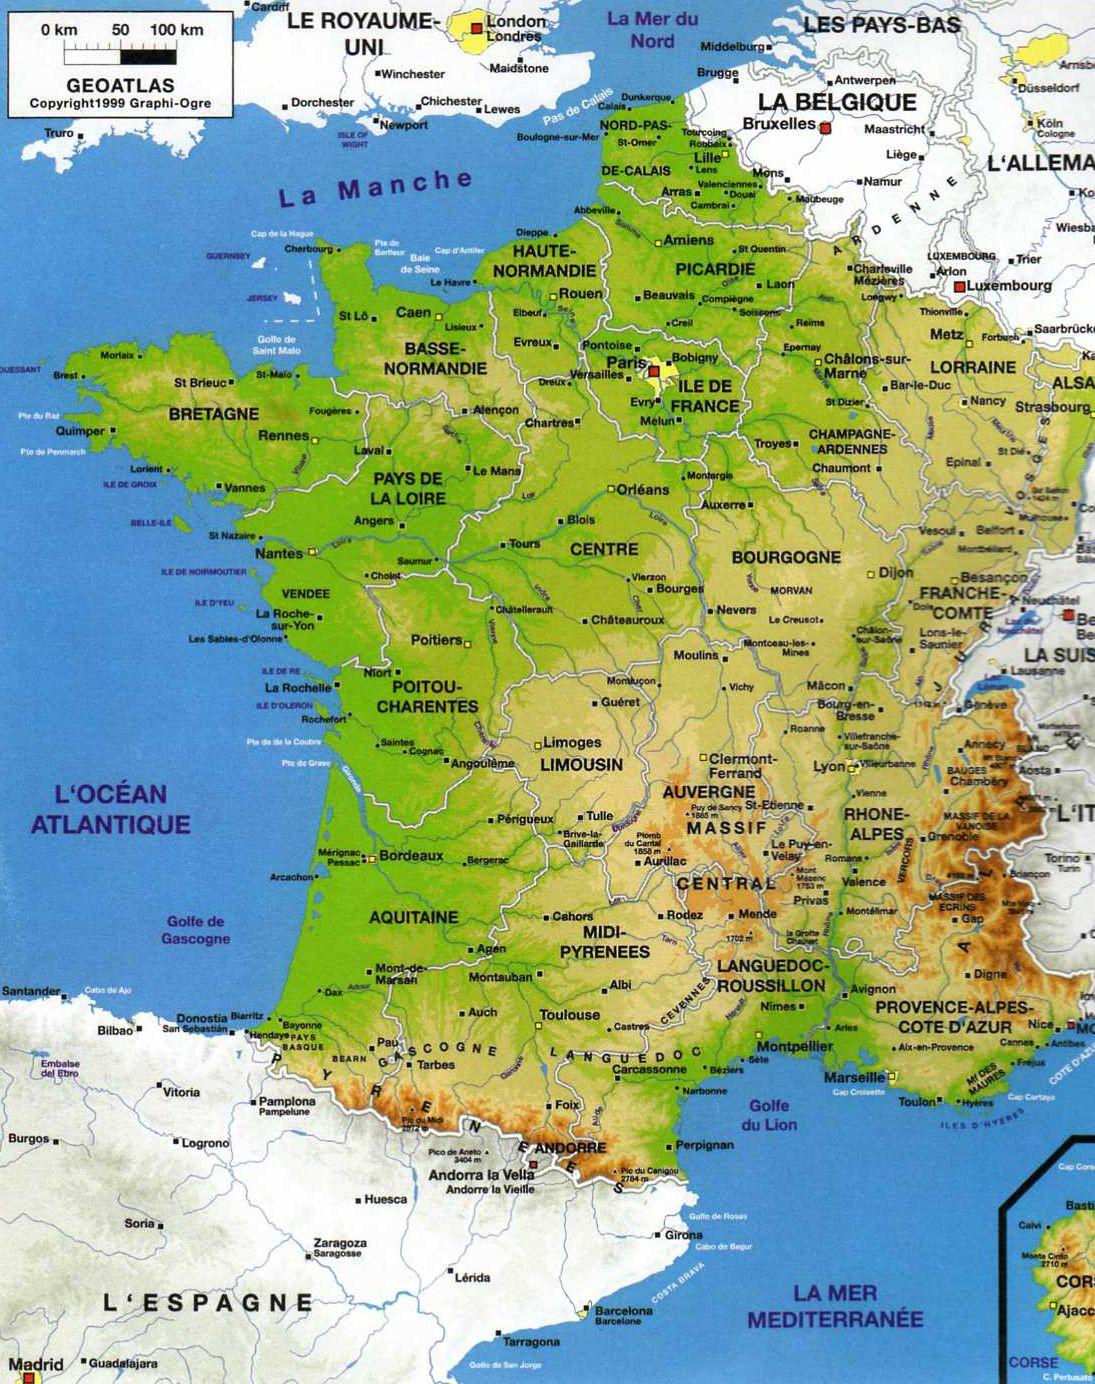 Carte Des Fleuves Du Monde : carte, fleuves, monde, Image�:, Infos, Carte, France, Villes, Principales, Fleuves